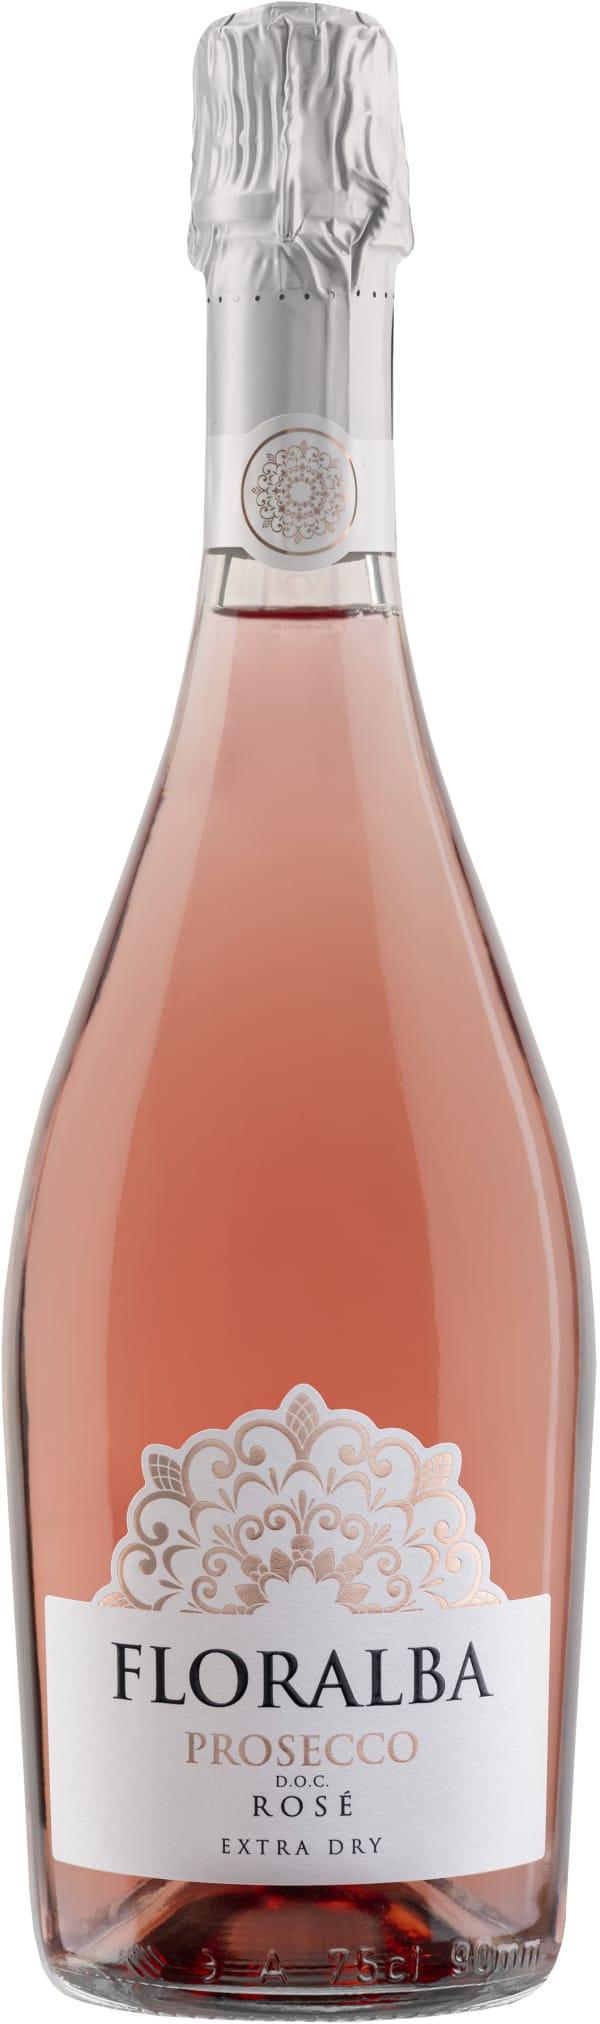 Floralba Prosecco Rosé Extra Dry 2019